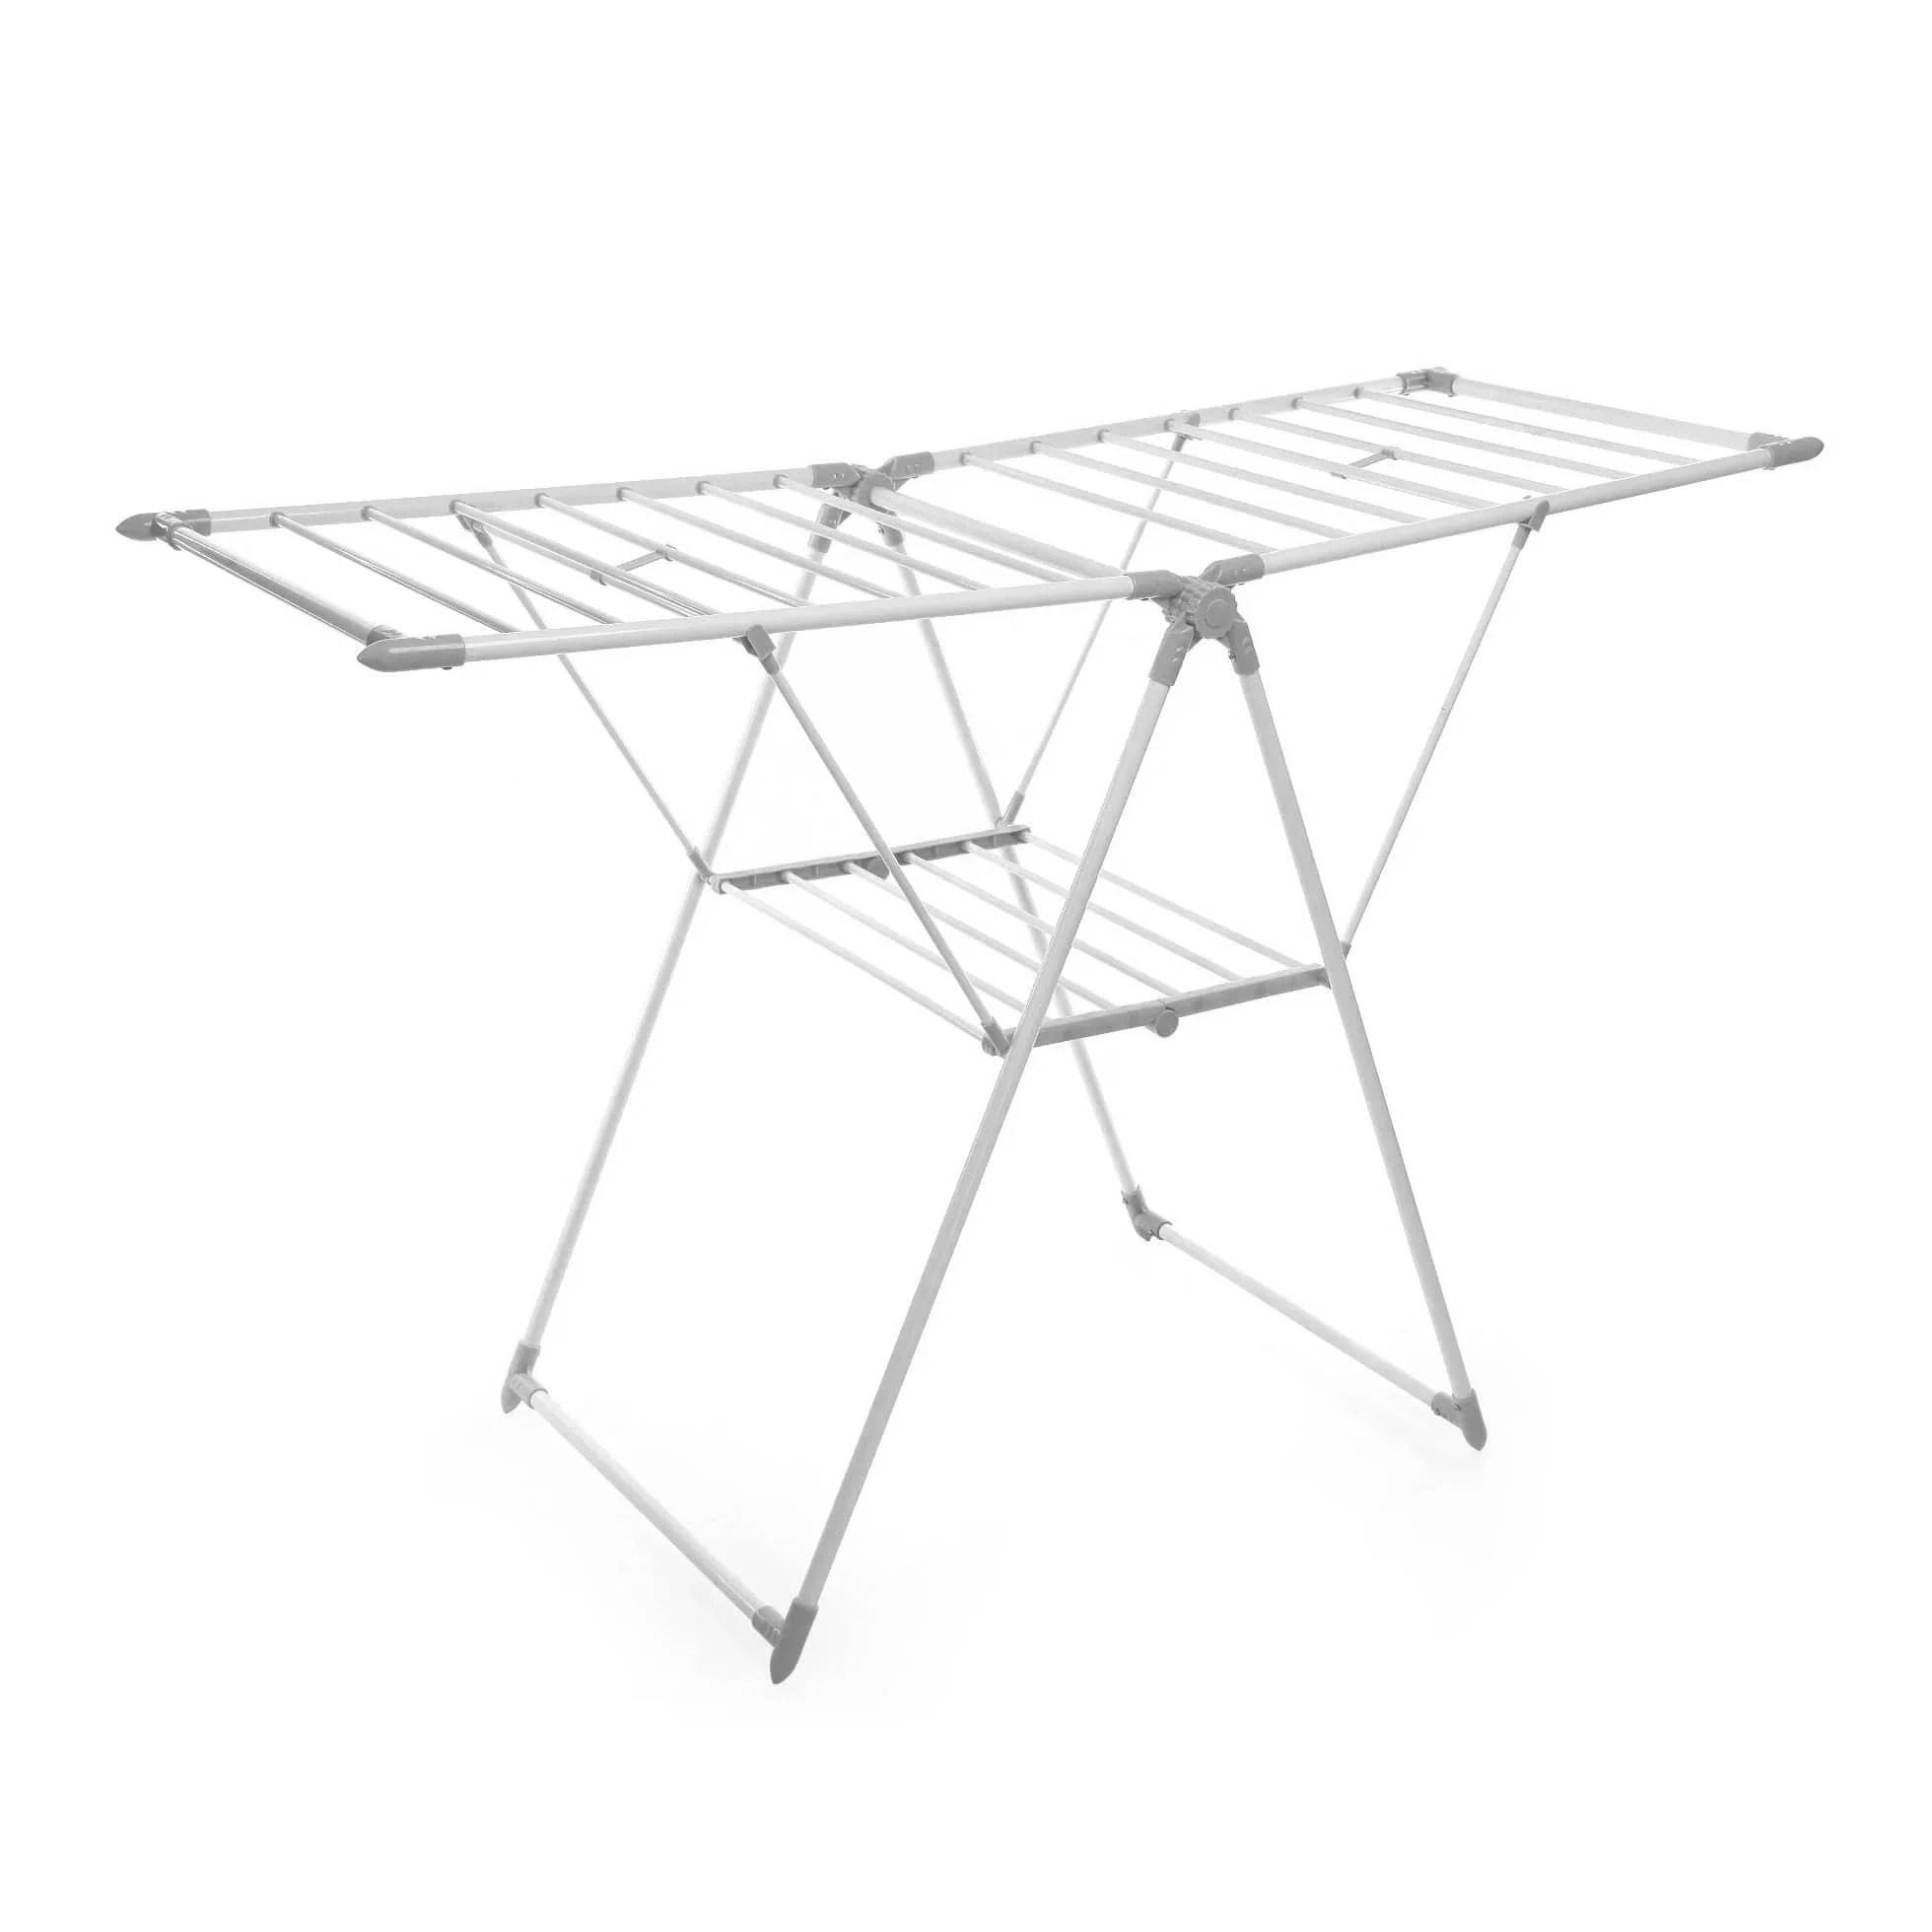 plastic foldable drying rack snatcher